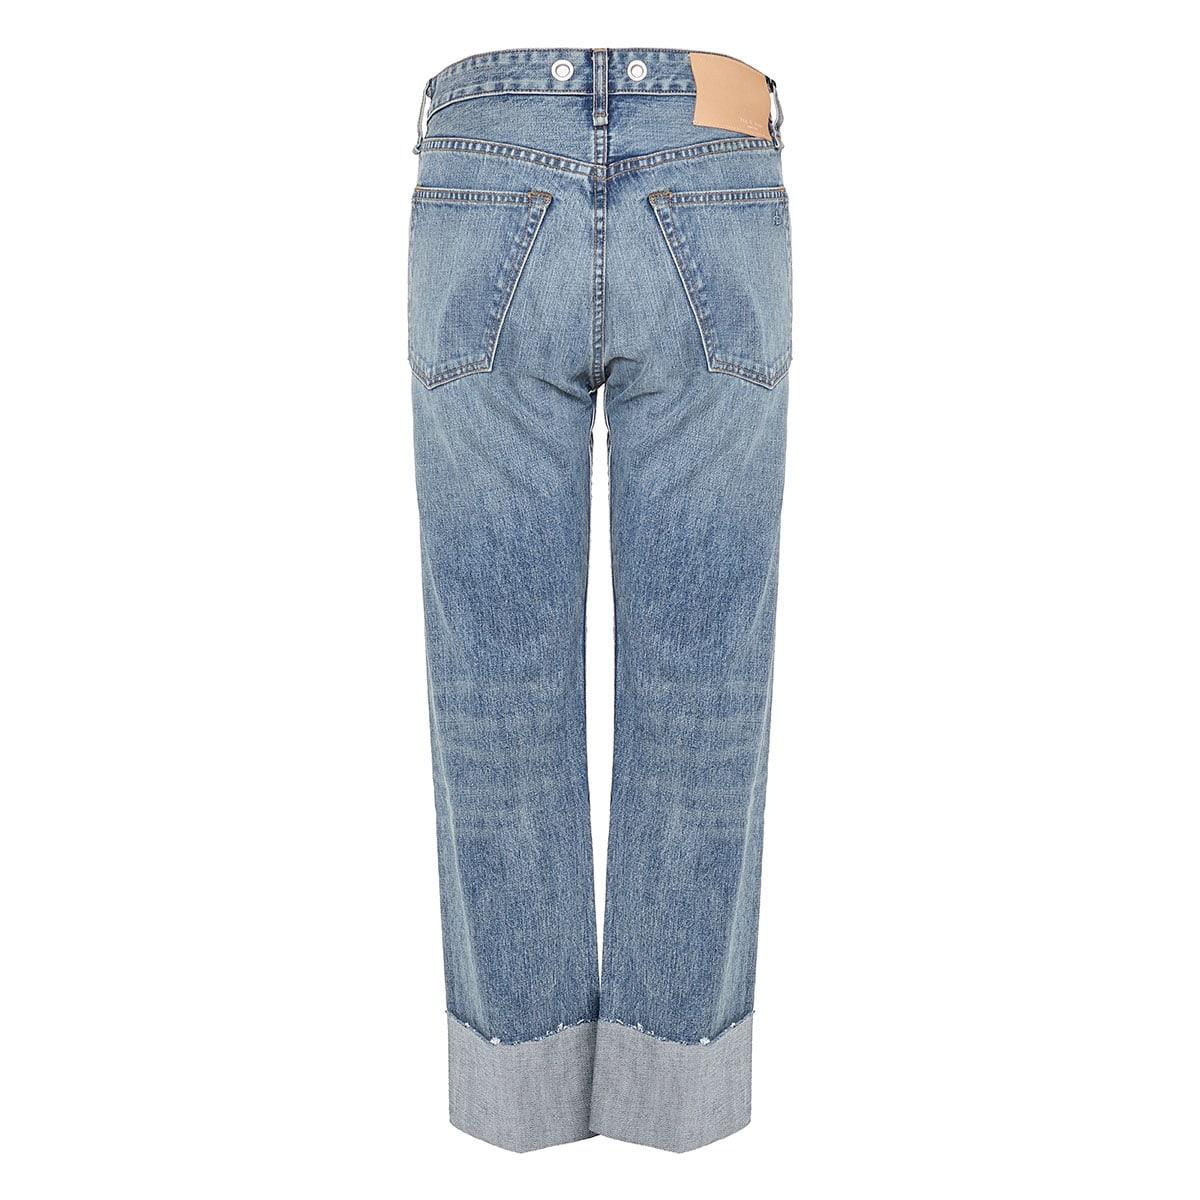 Maya loose-fit distressed jeans